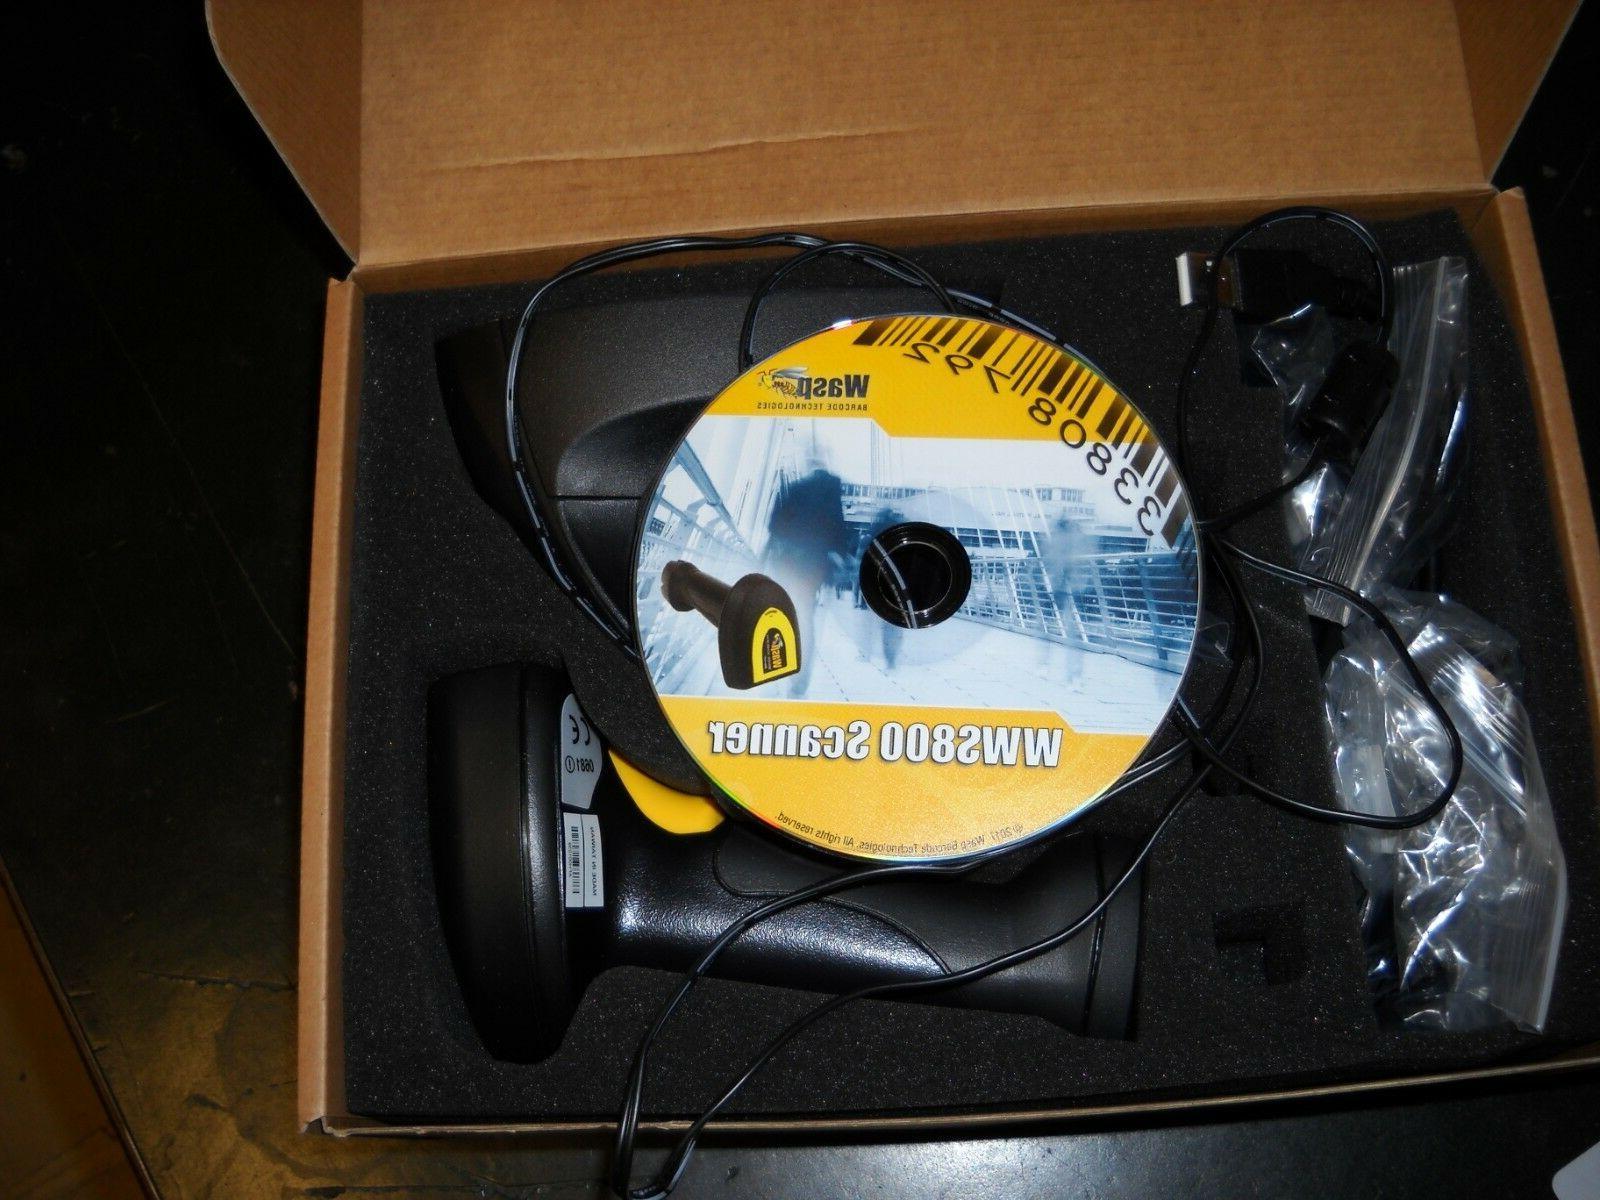 633808920128 wws800 wireless barcode scanner